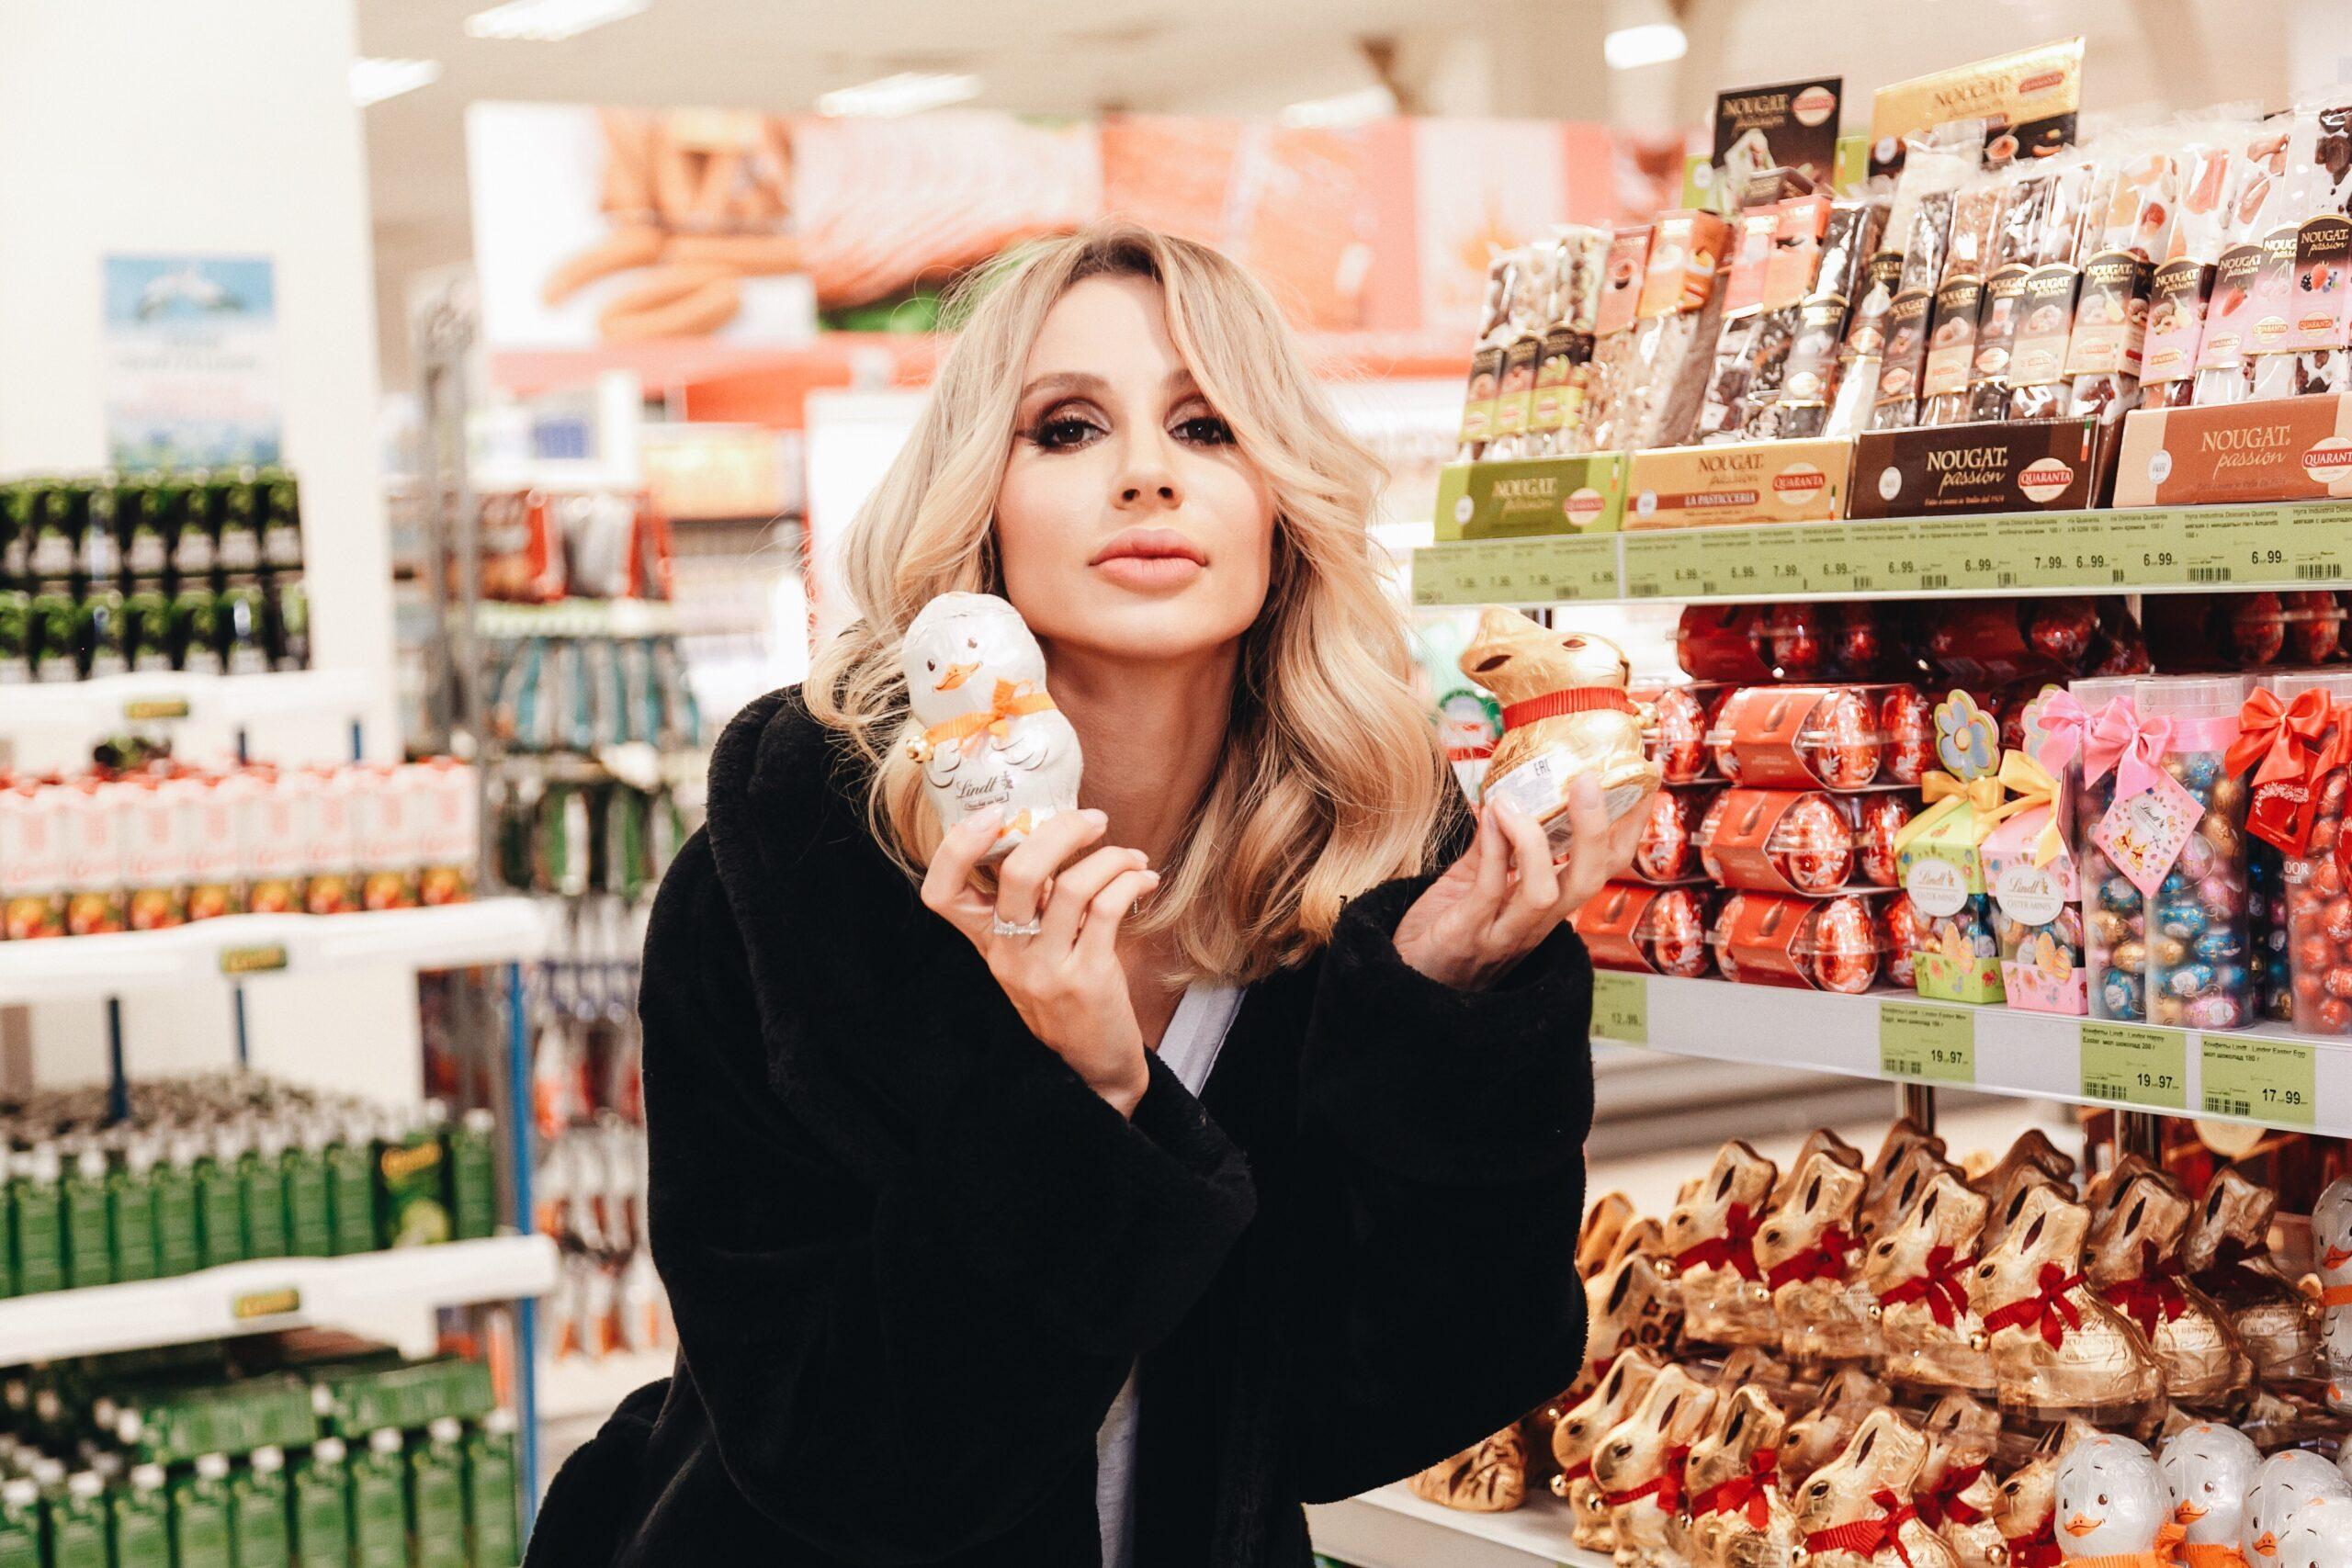 6 звезд, которых папарацци застали в супермаркетах